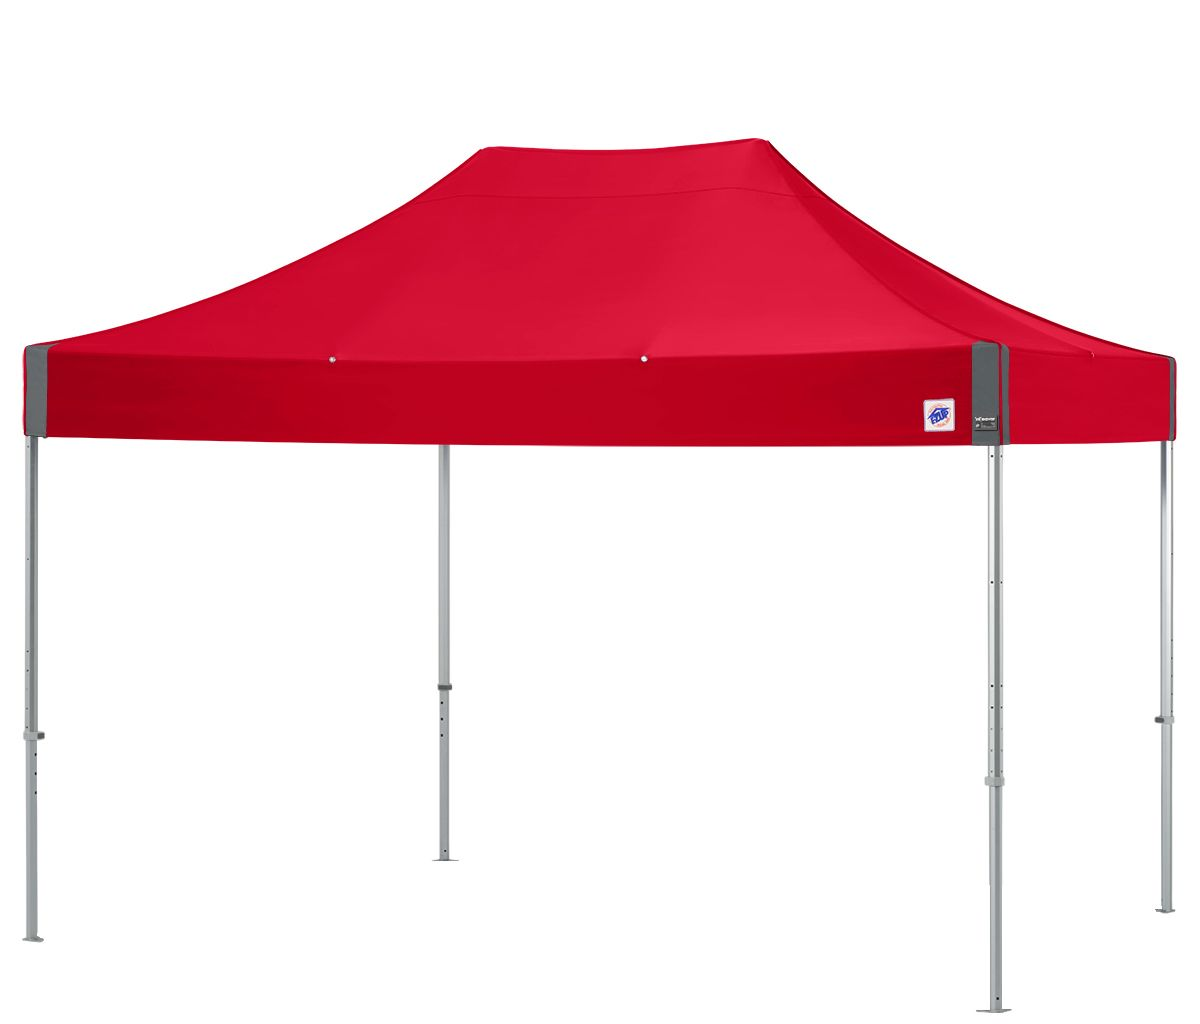 endeavor 3x4.5m rood